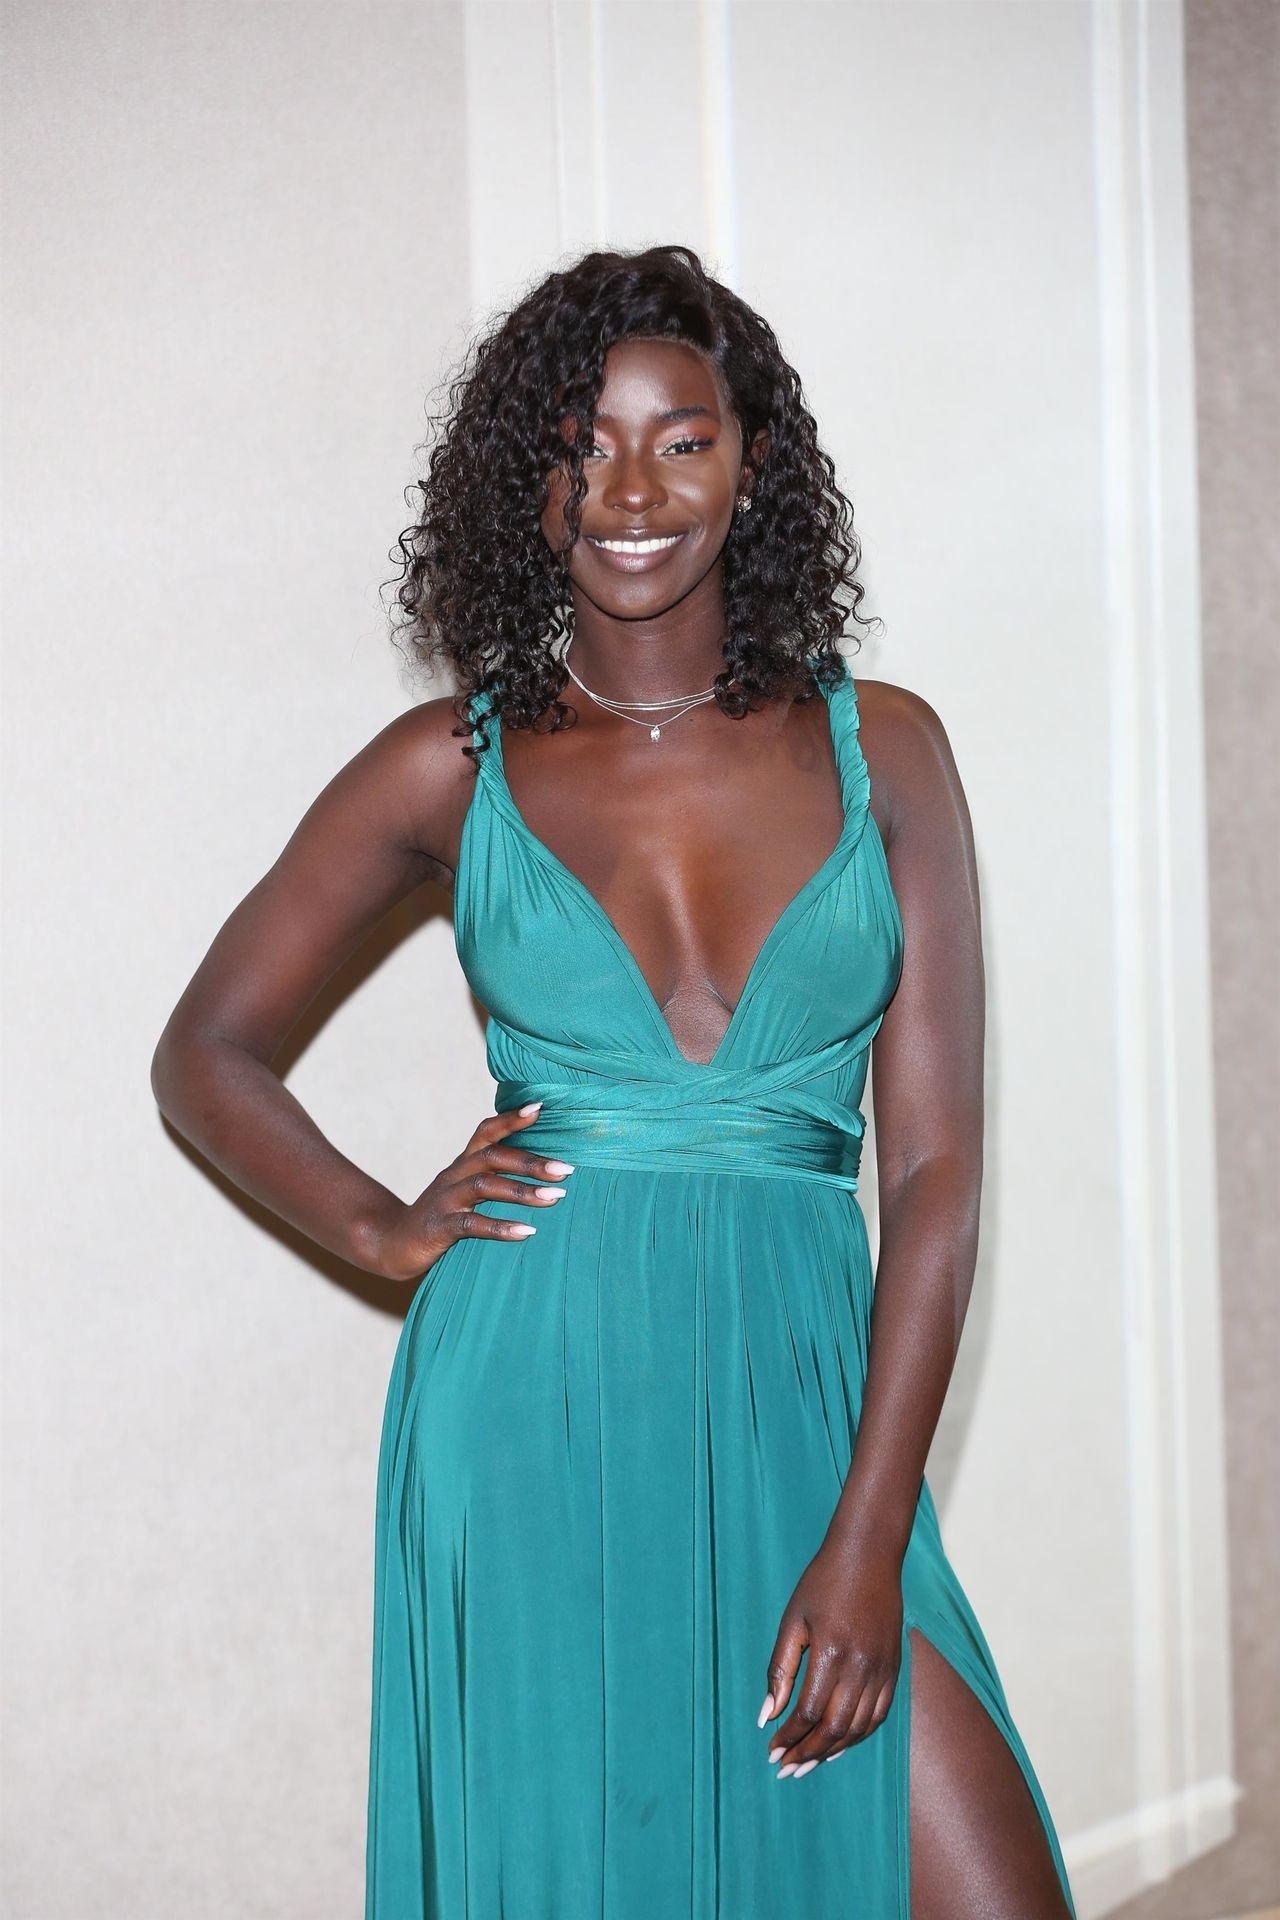 Mike Boateng & Priscilla Anyabu Are Seen At British Ethnic Diversity Sports Awards 0149